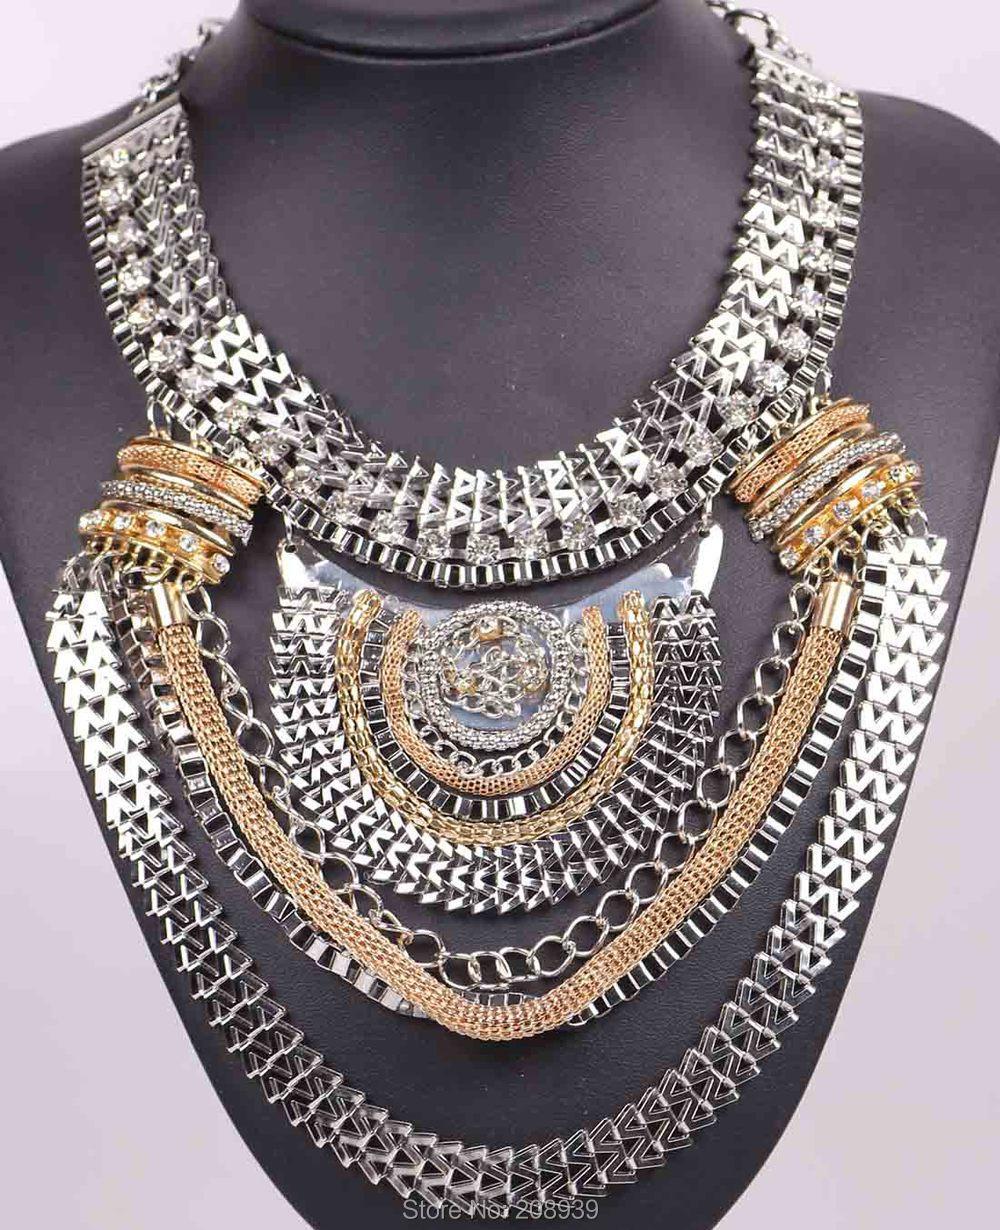 Joyería de moda hecha a mano novedosa, cadena geométrica Bohemia, collar gargantilla para mujer Q965